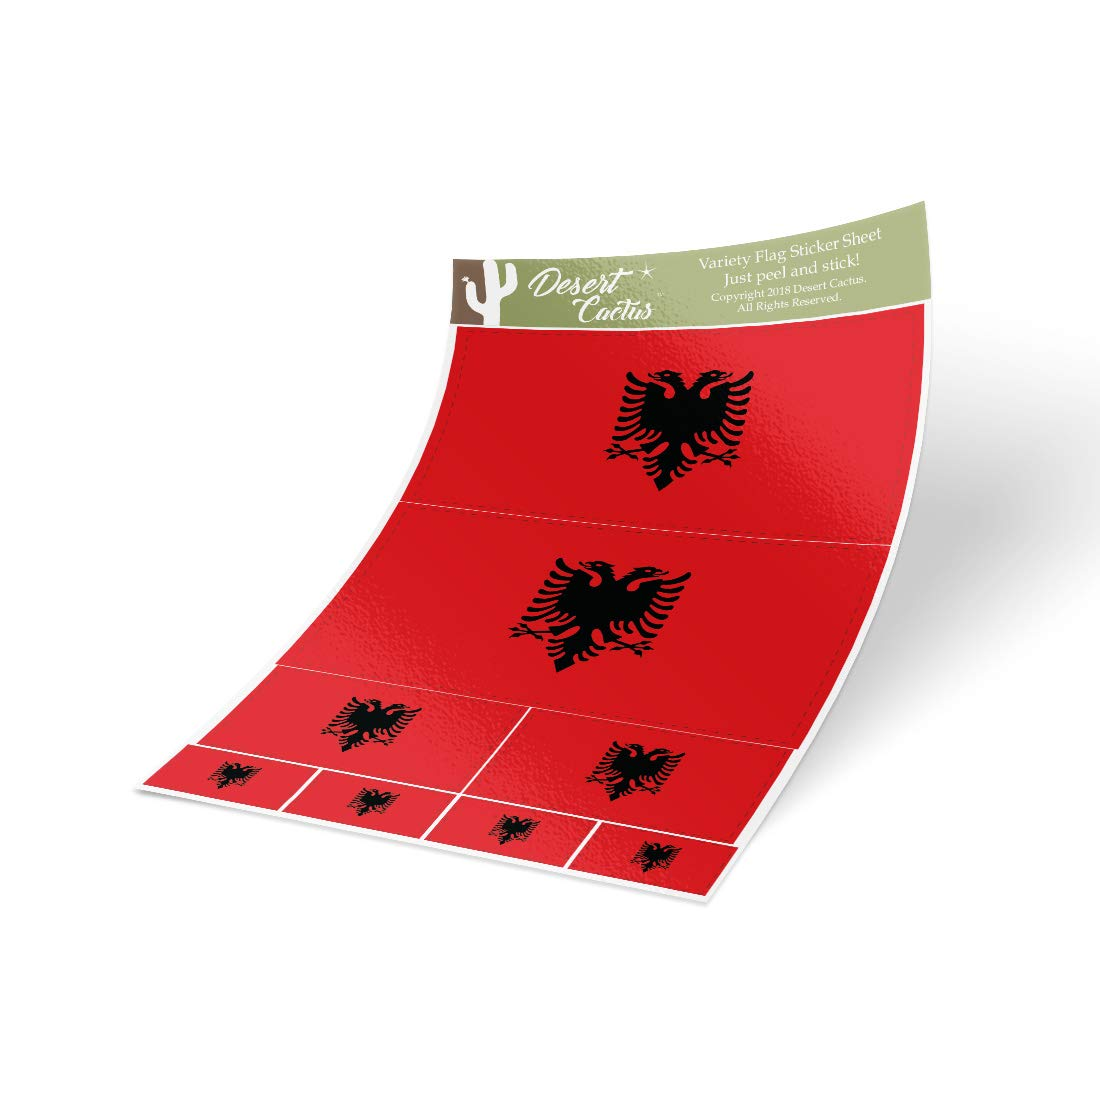 Desert Cactus Albania Country Flag Sticker Decal Variety Size Pack 8 Total Pieces Kids Logo Scrapbook Car Vinyl Window Bumper Laptop Albanian V